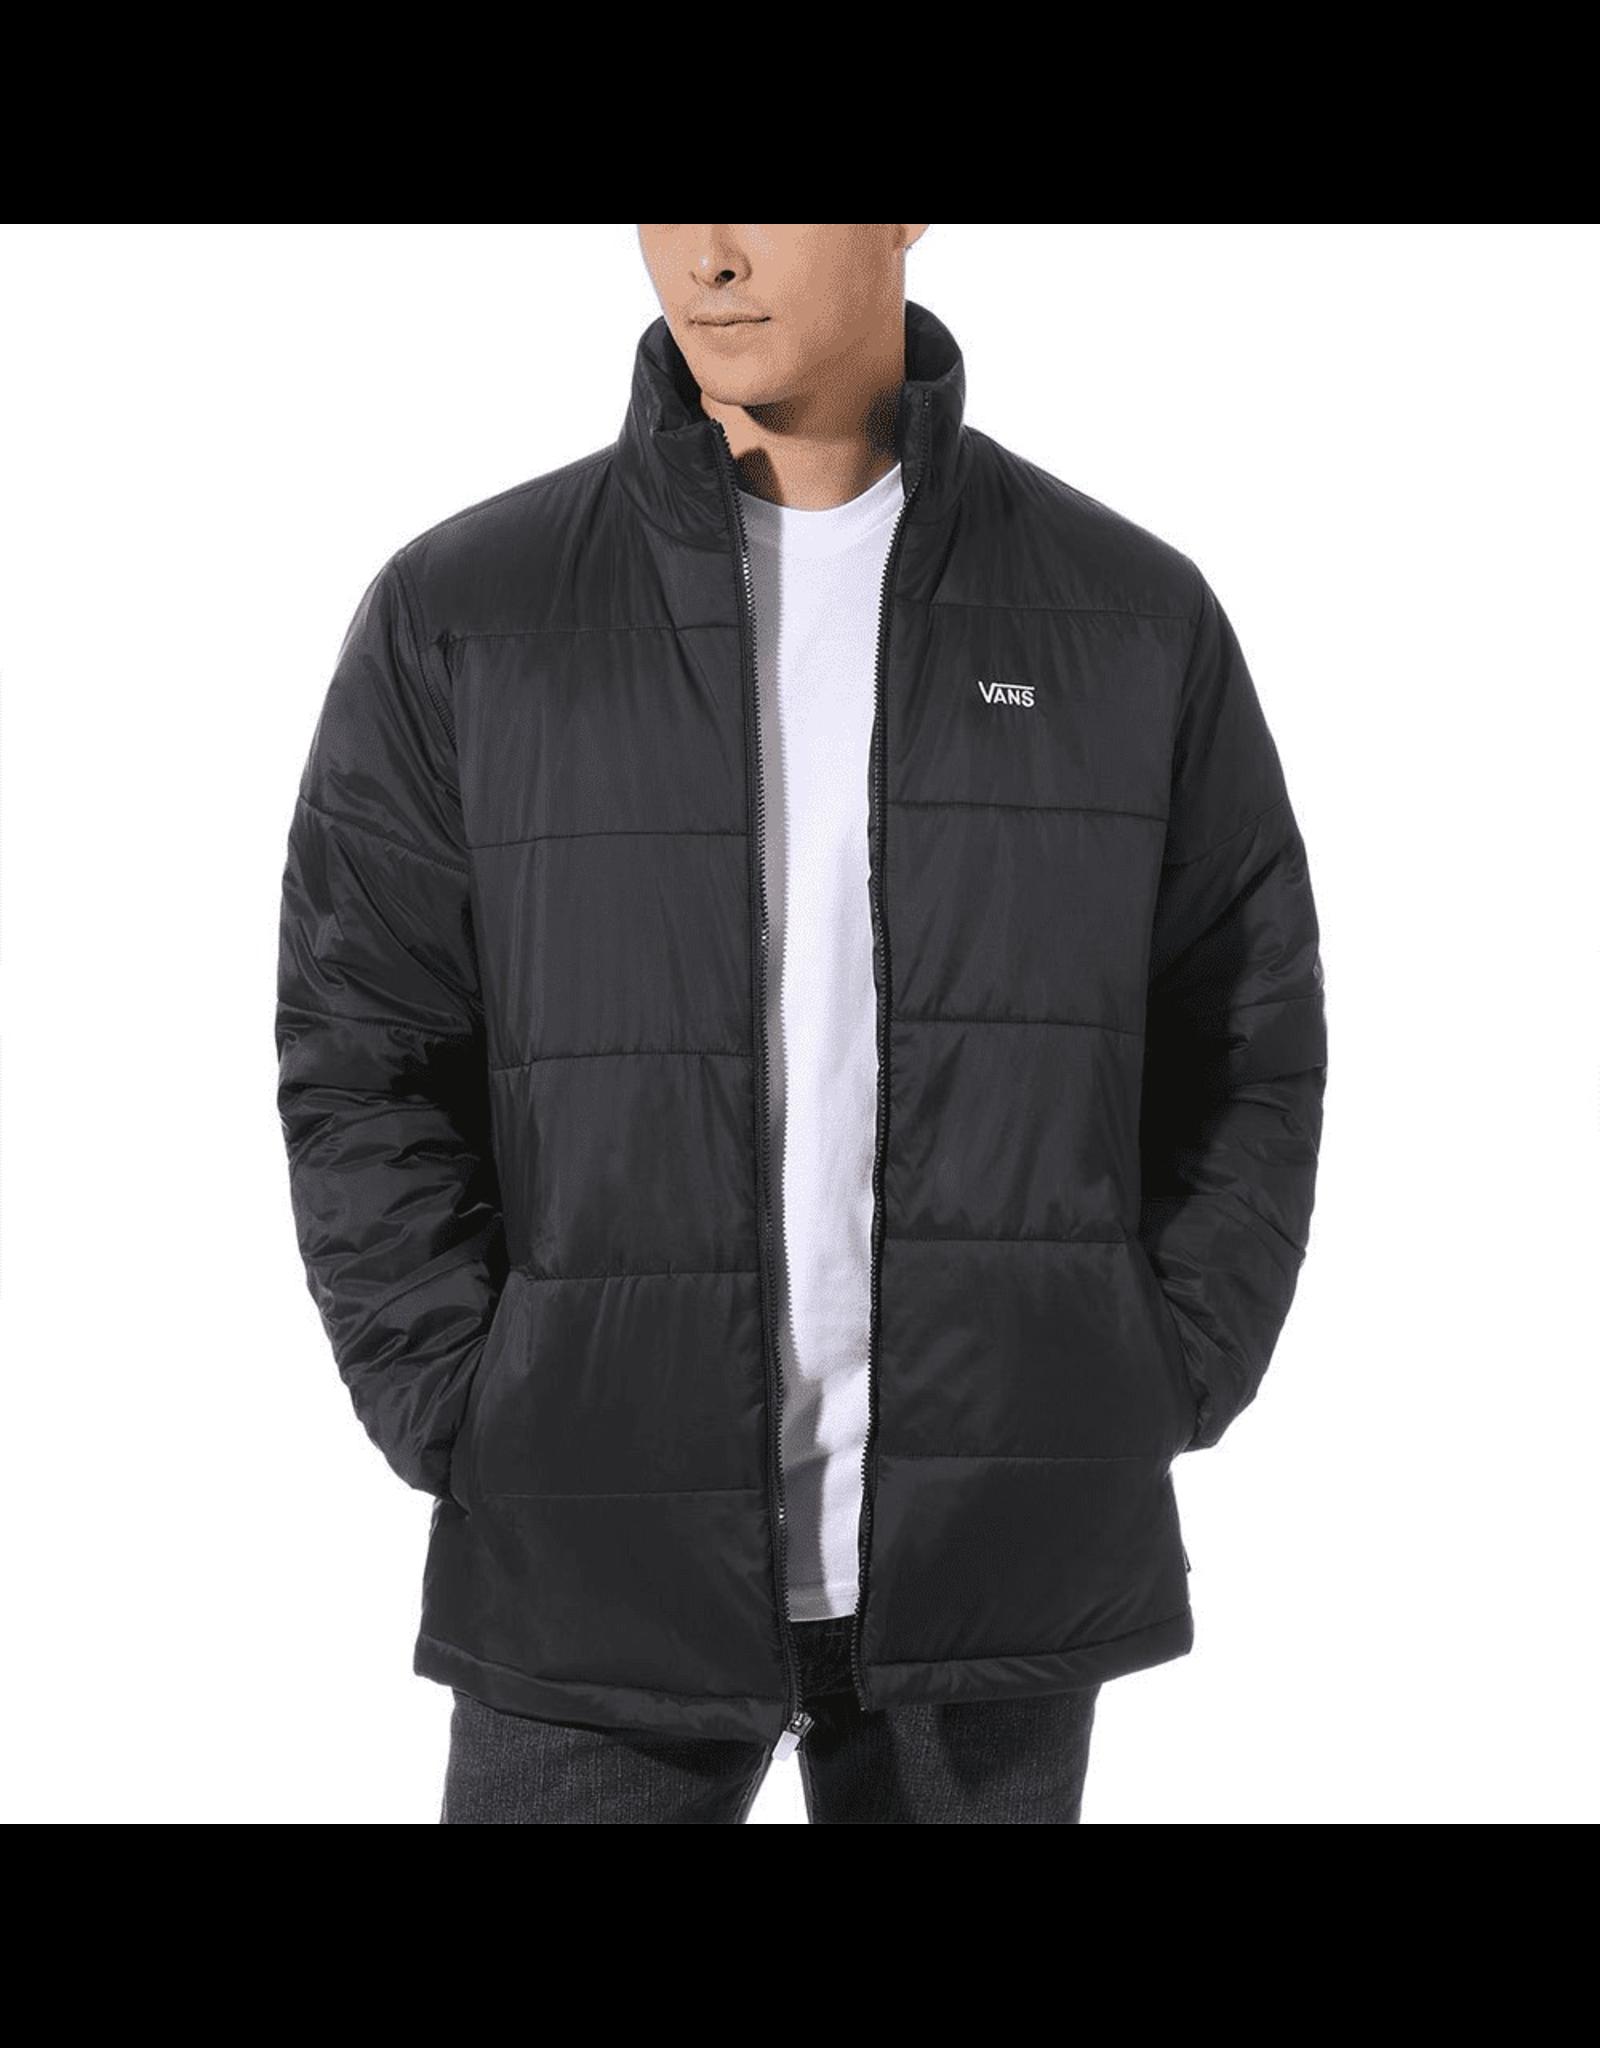 Vans Layton Jacket